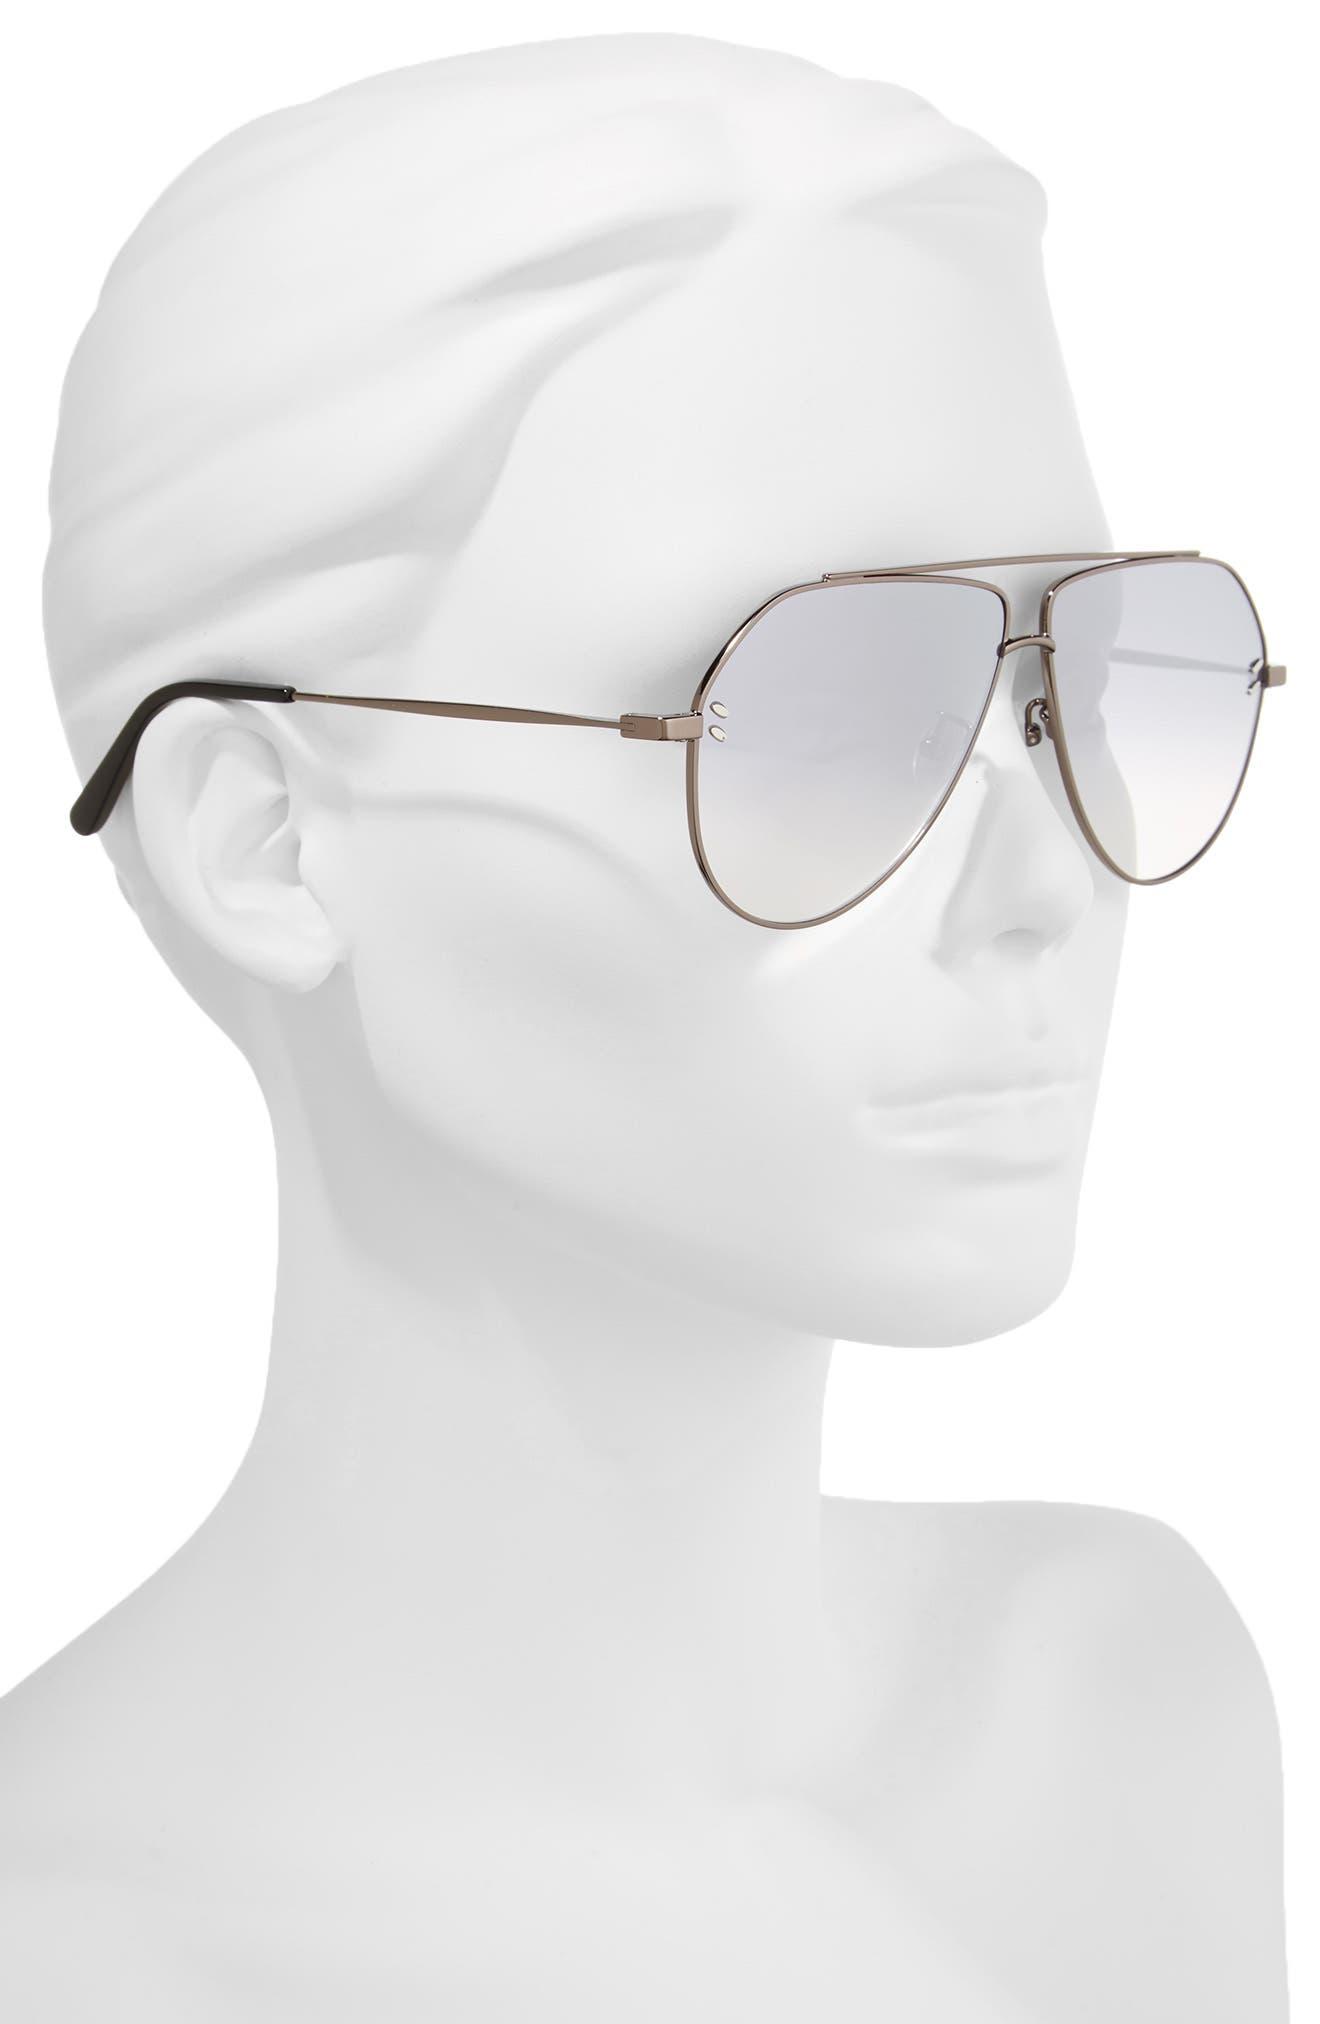 60mm Aviator Sunglasses,                             Alternate thumbnail 2, color,                             Ruthenium